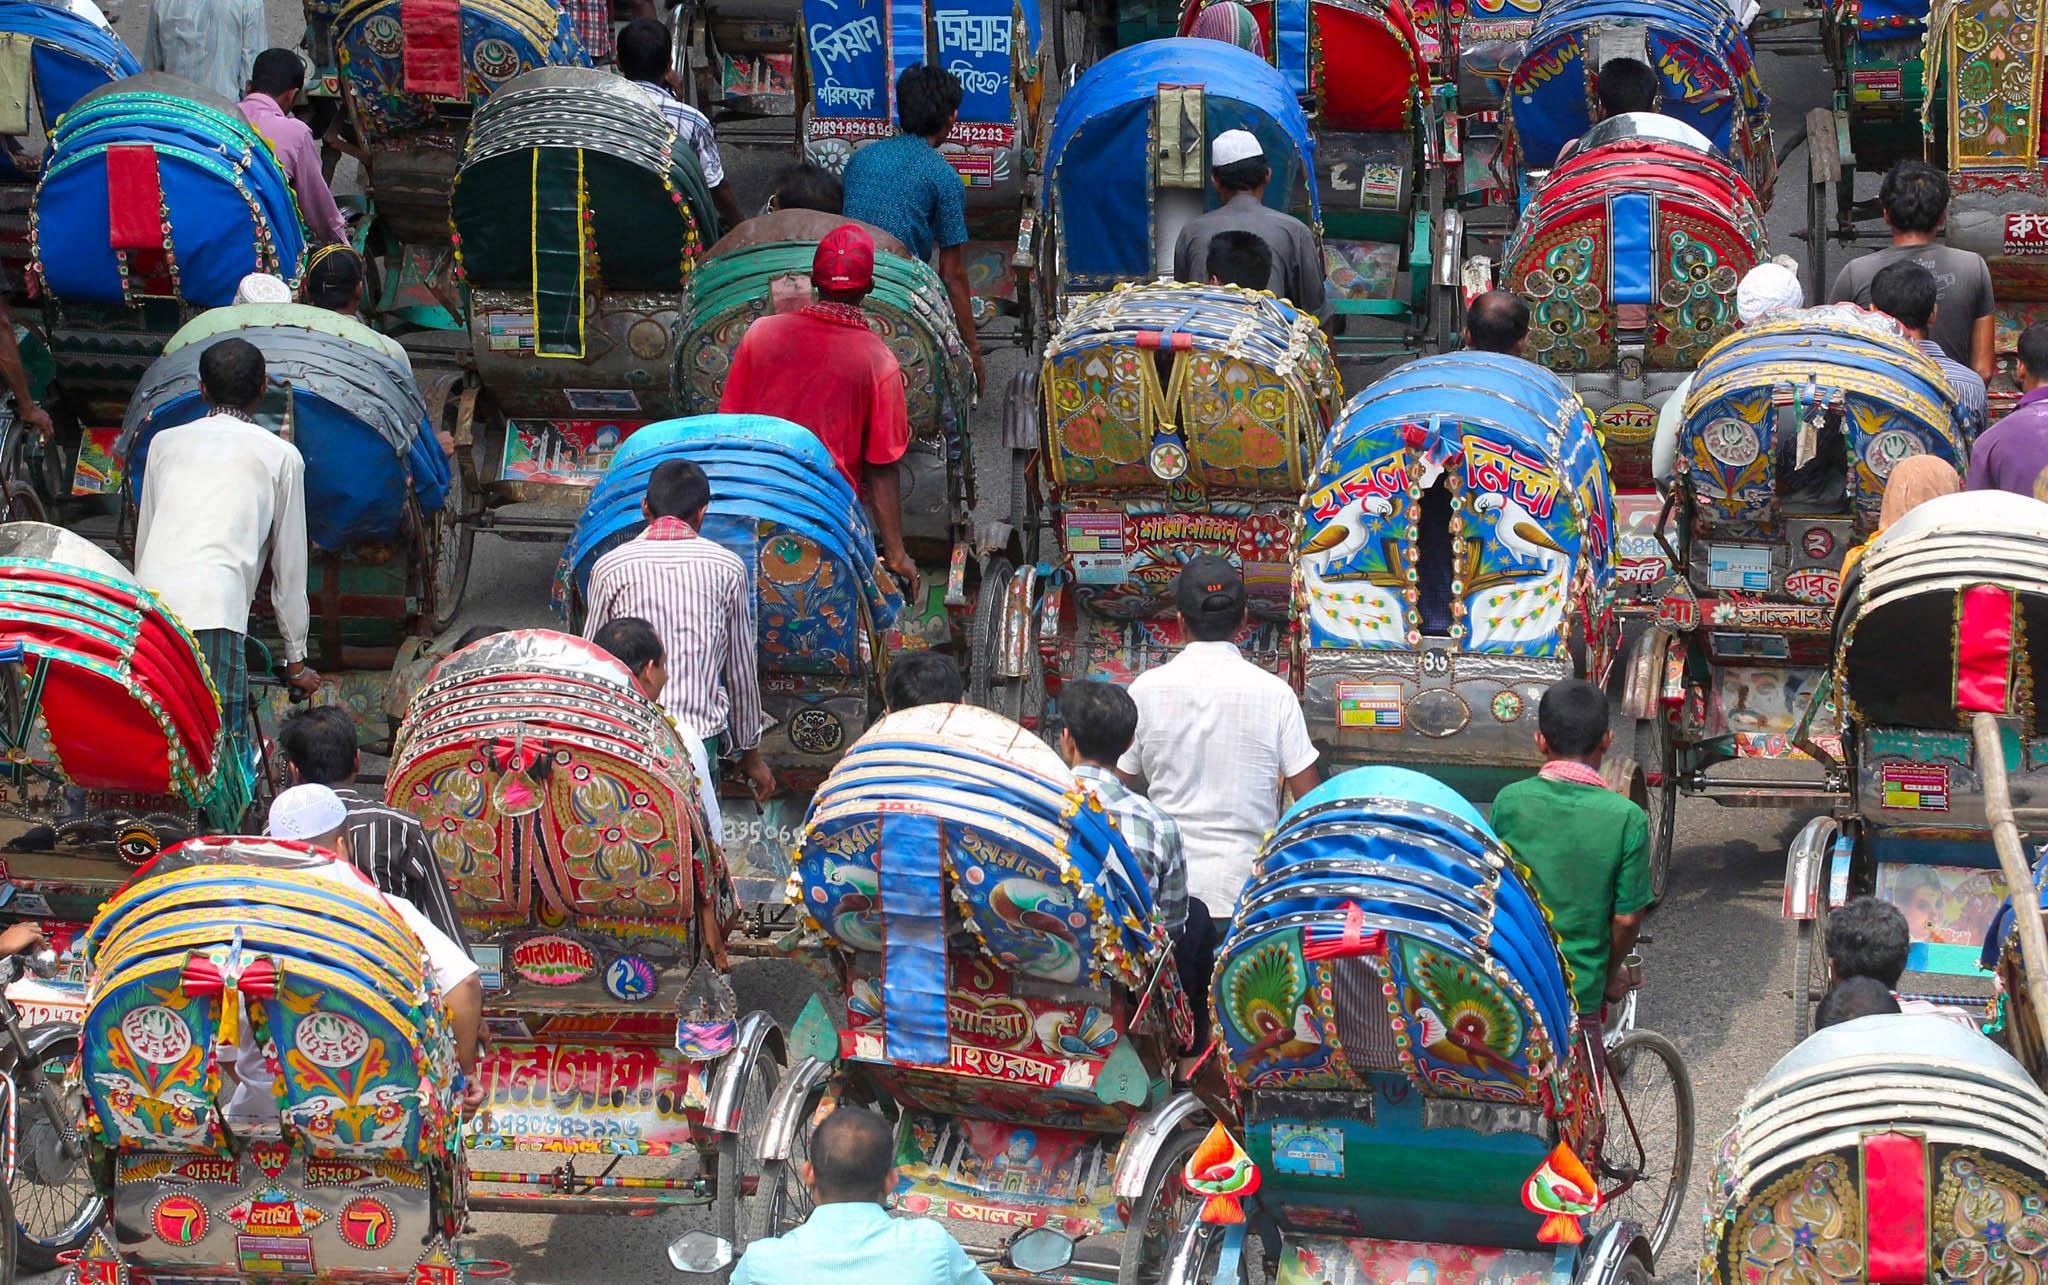 To make Dhaka rickshaw capital of the world, at least 400,000 rickshaws are traveling around the streets of Dhaka each day.